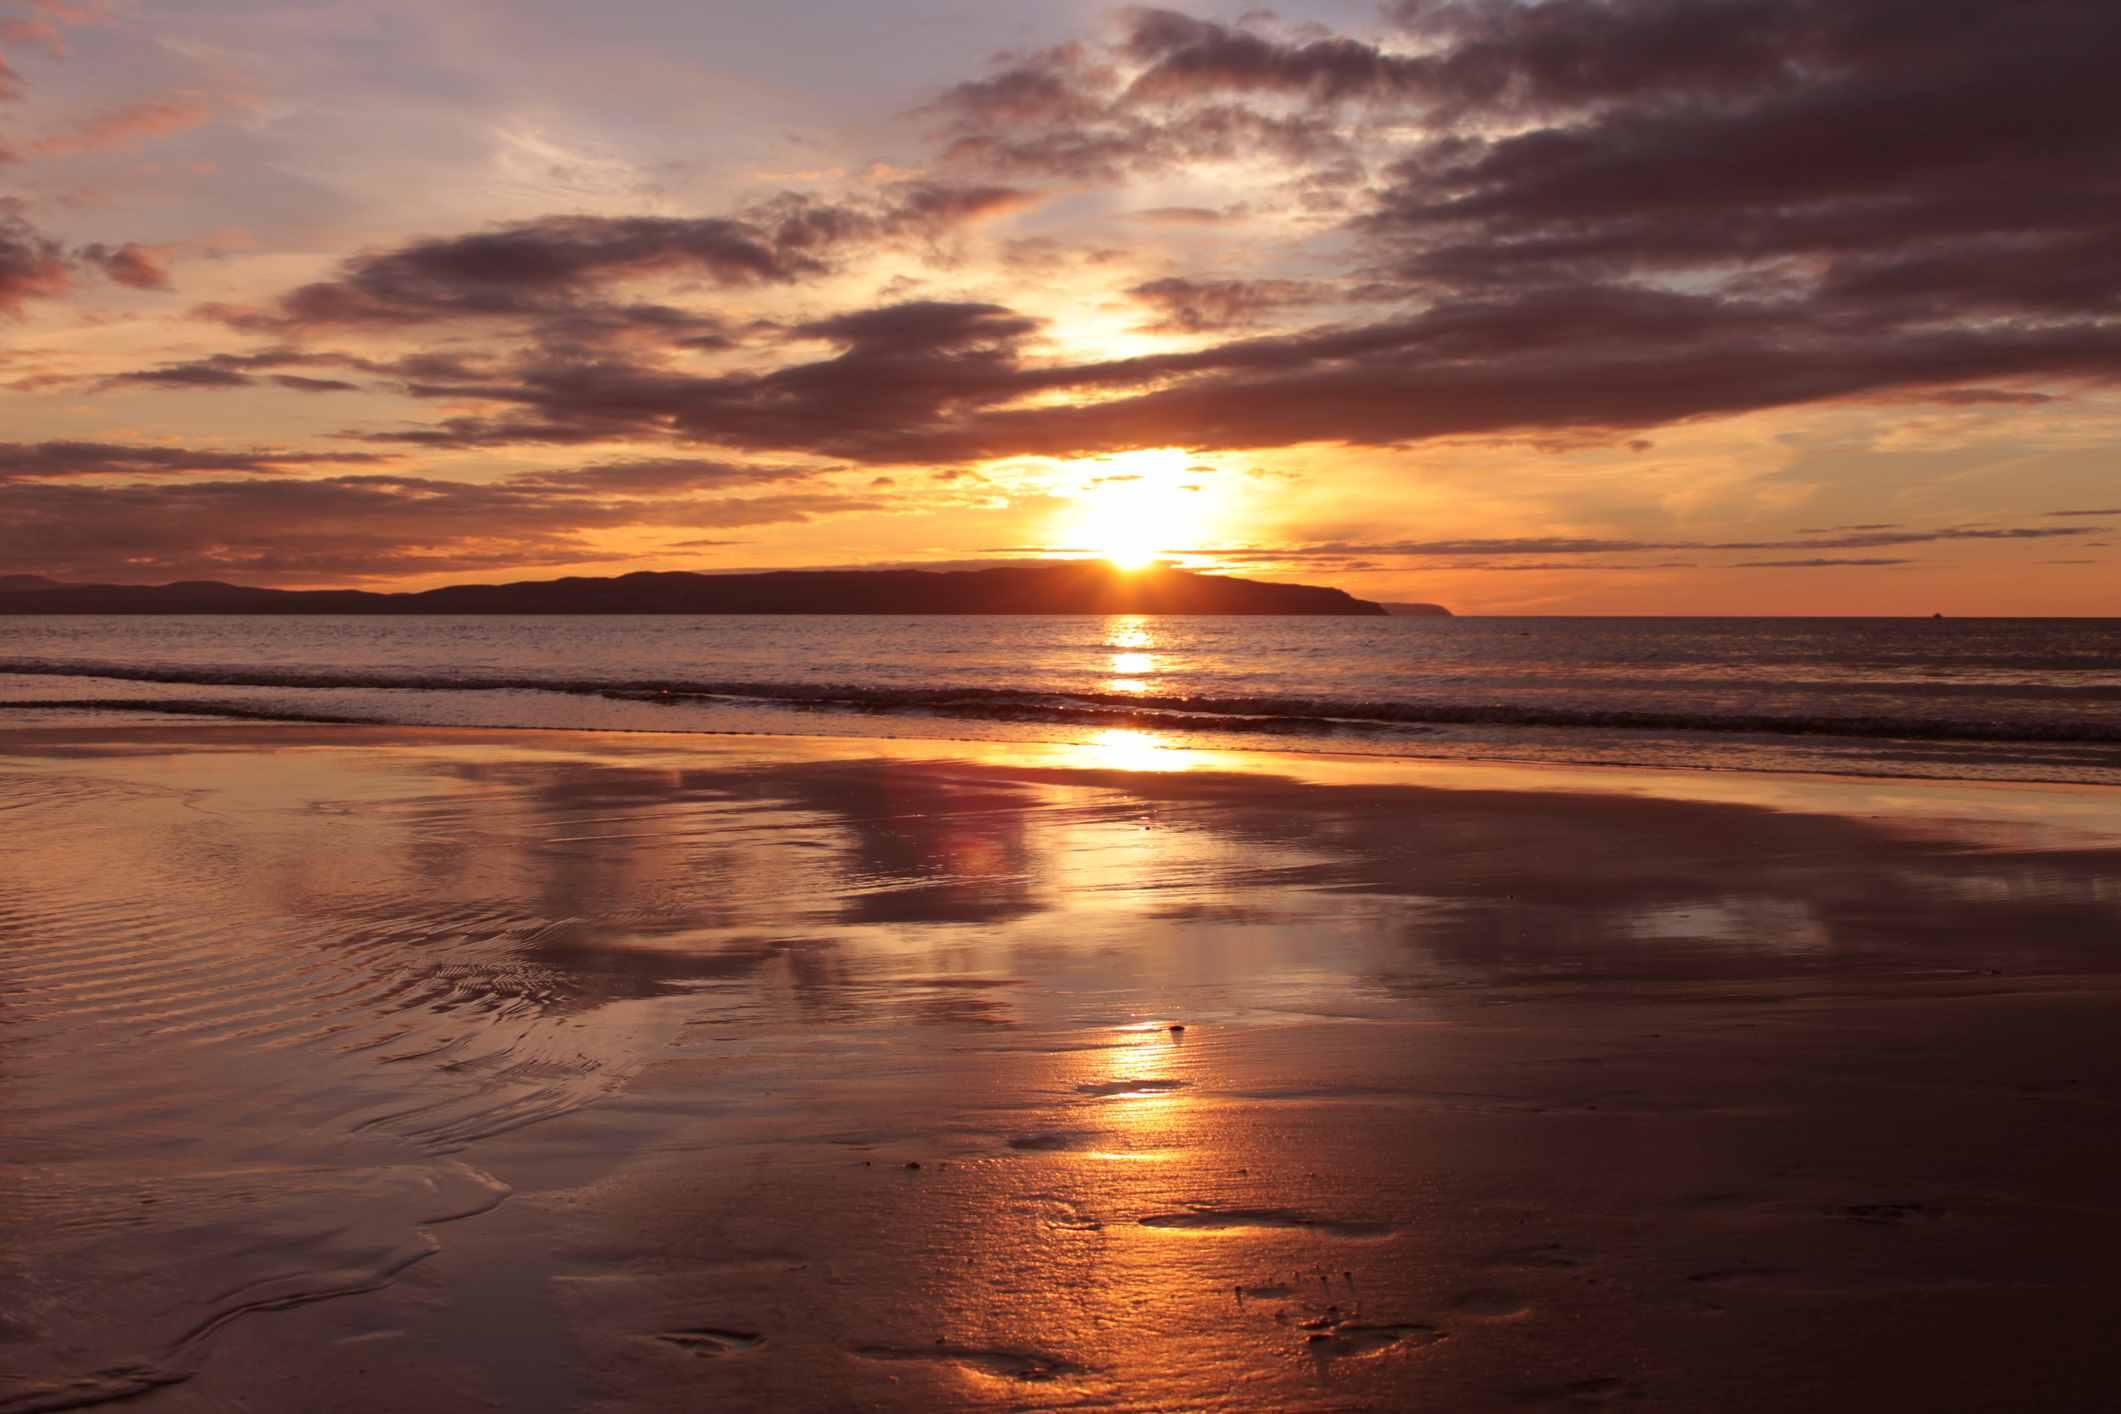 Sunset at Portstewart Strand